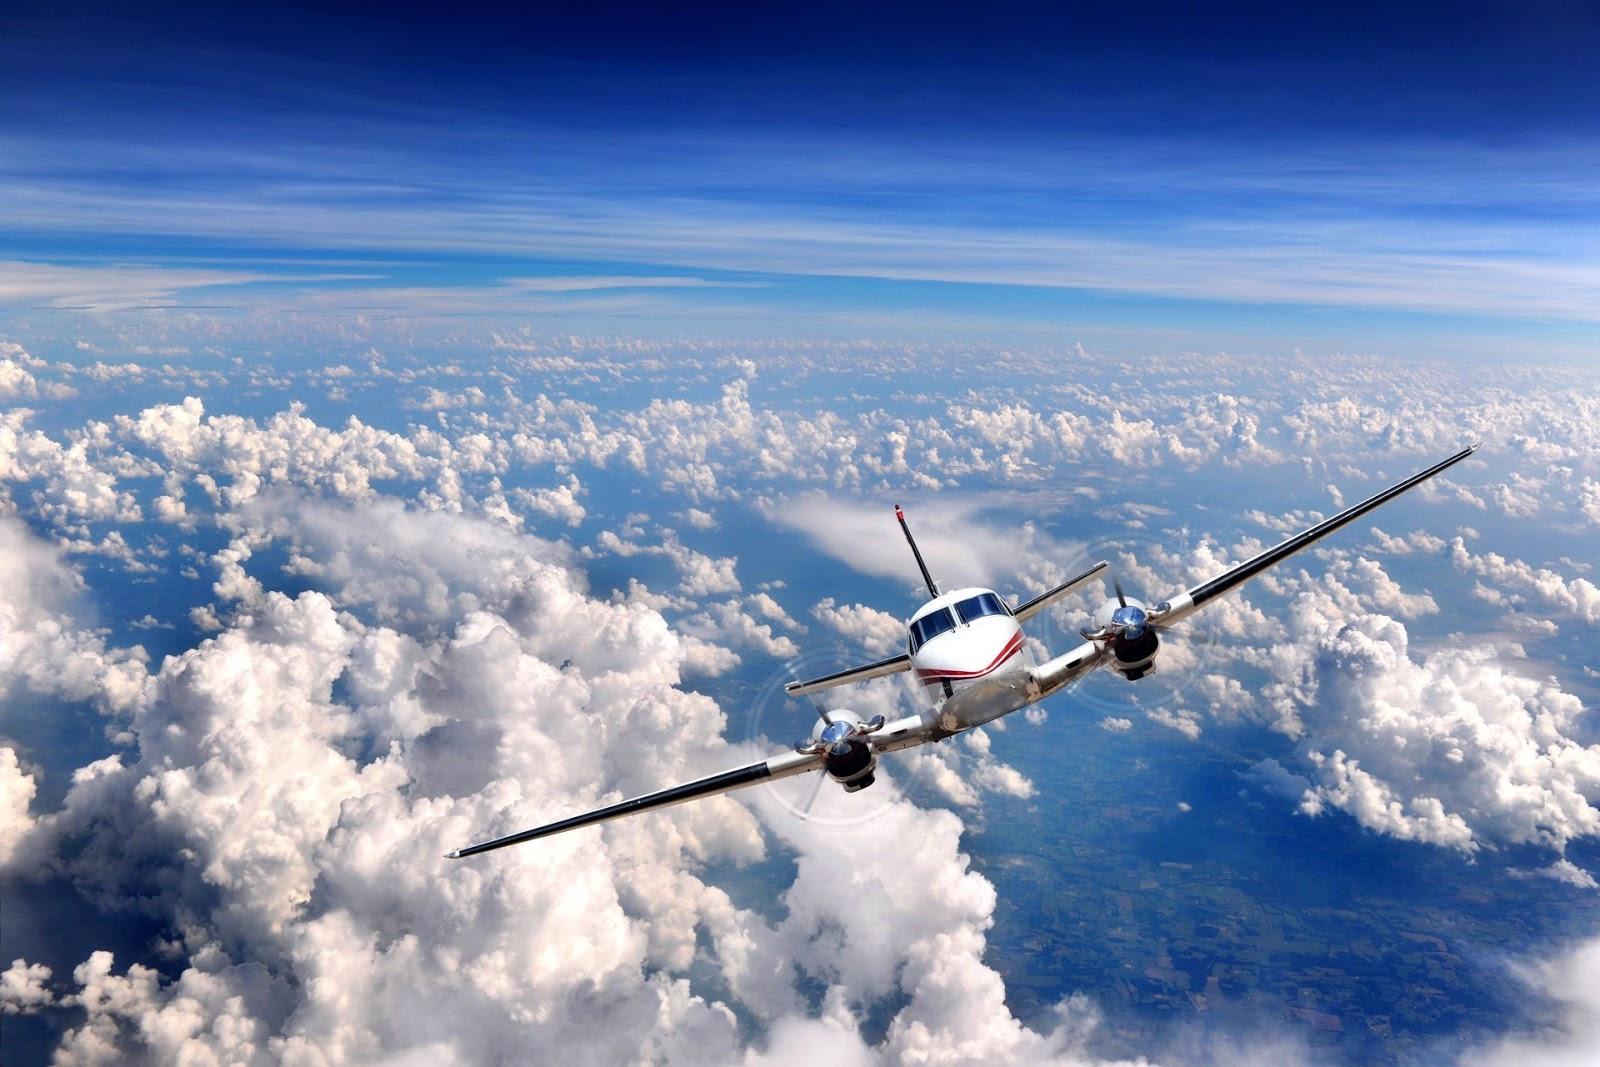 Avião voando sobre as nuvens